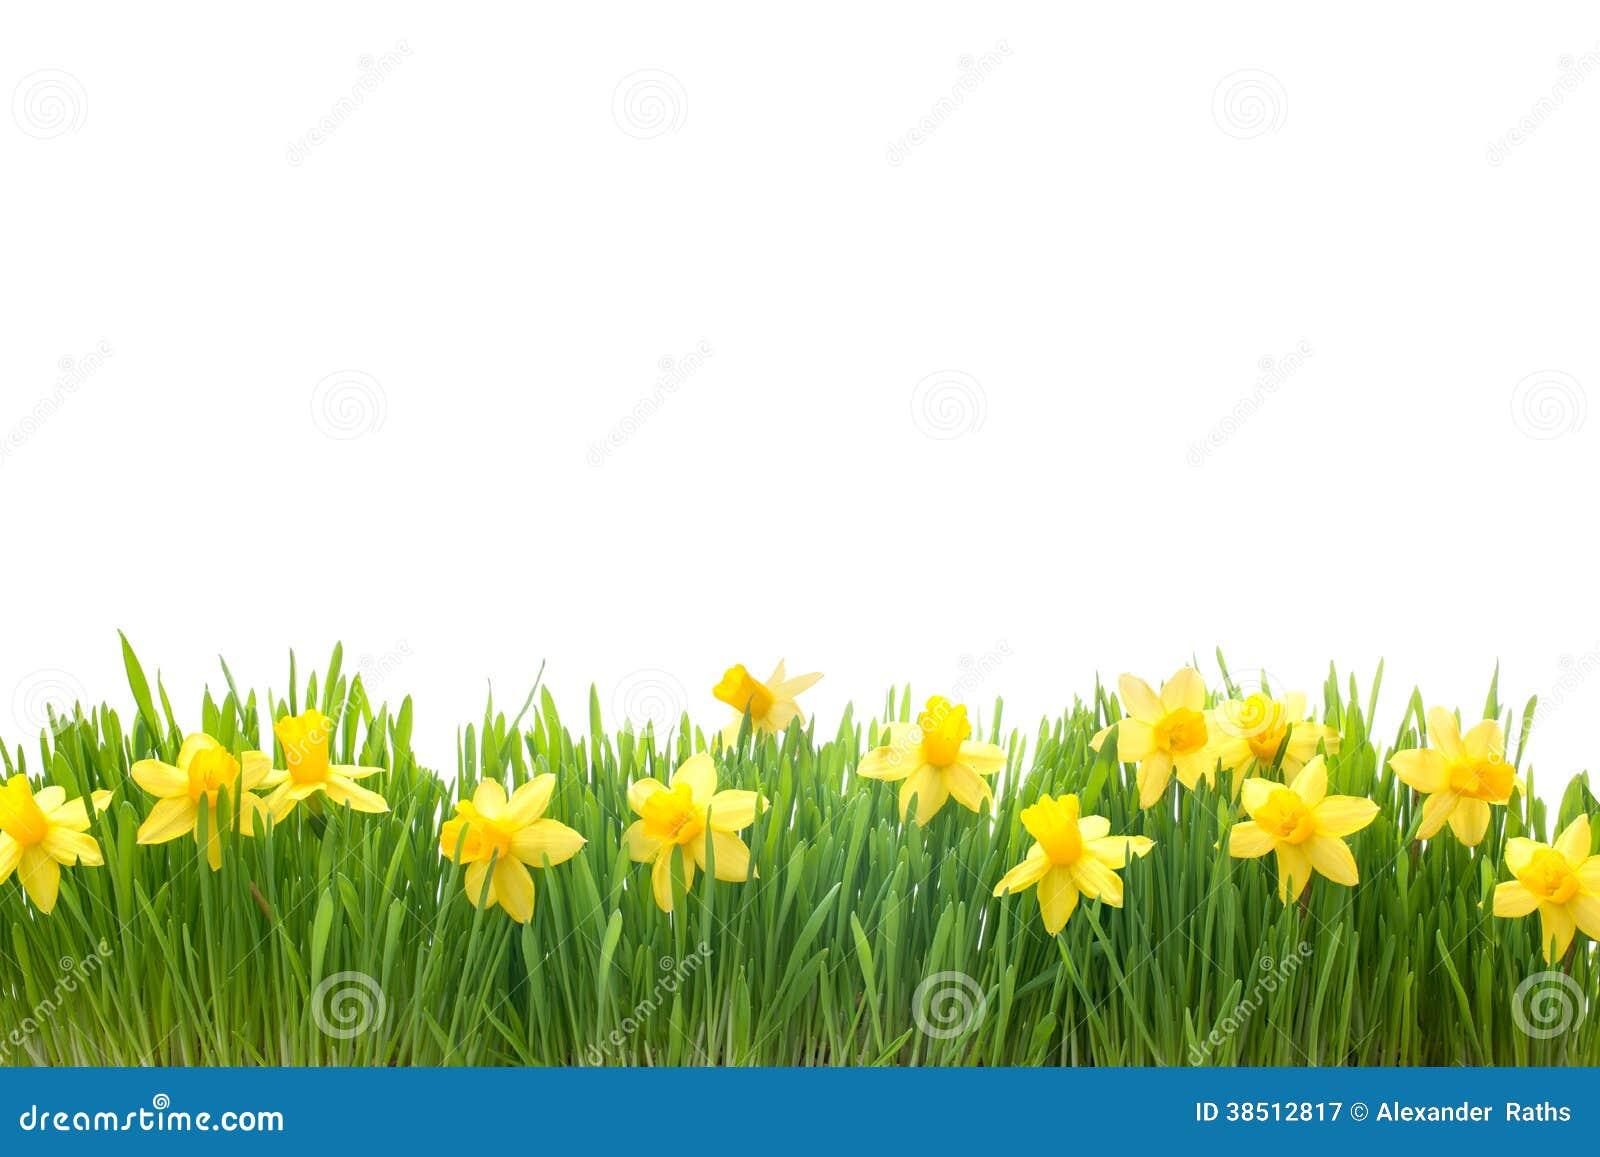 Frühlingsnarzissenblumen im grünen Gras